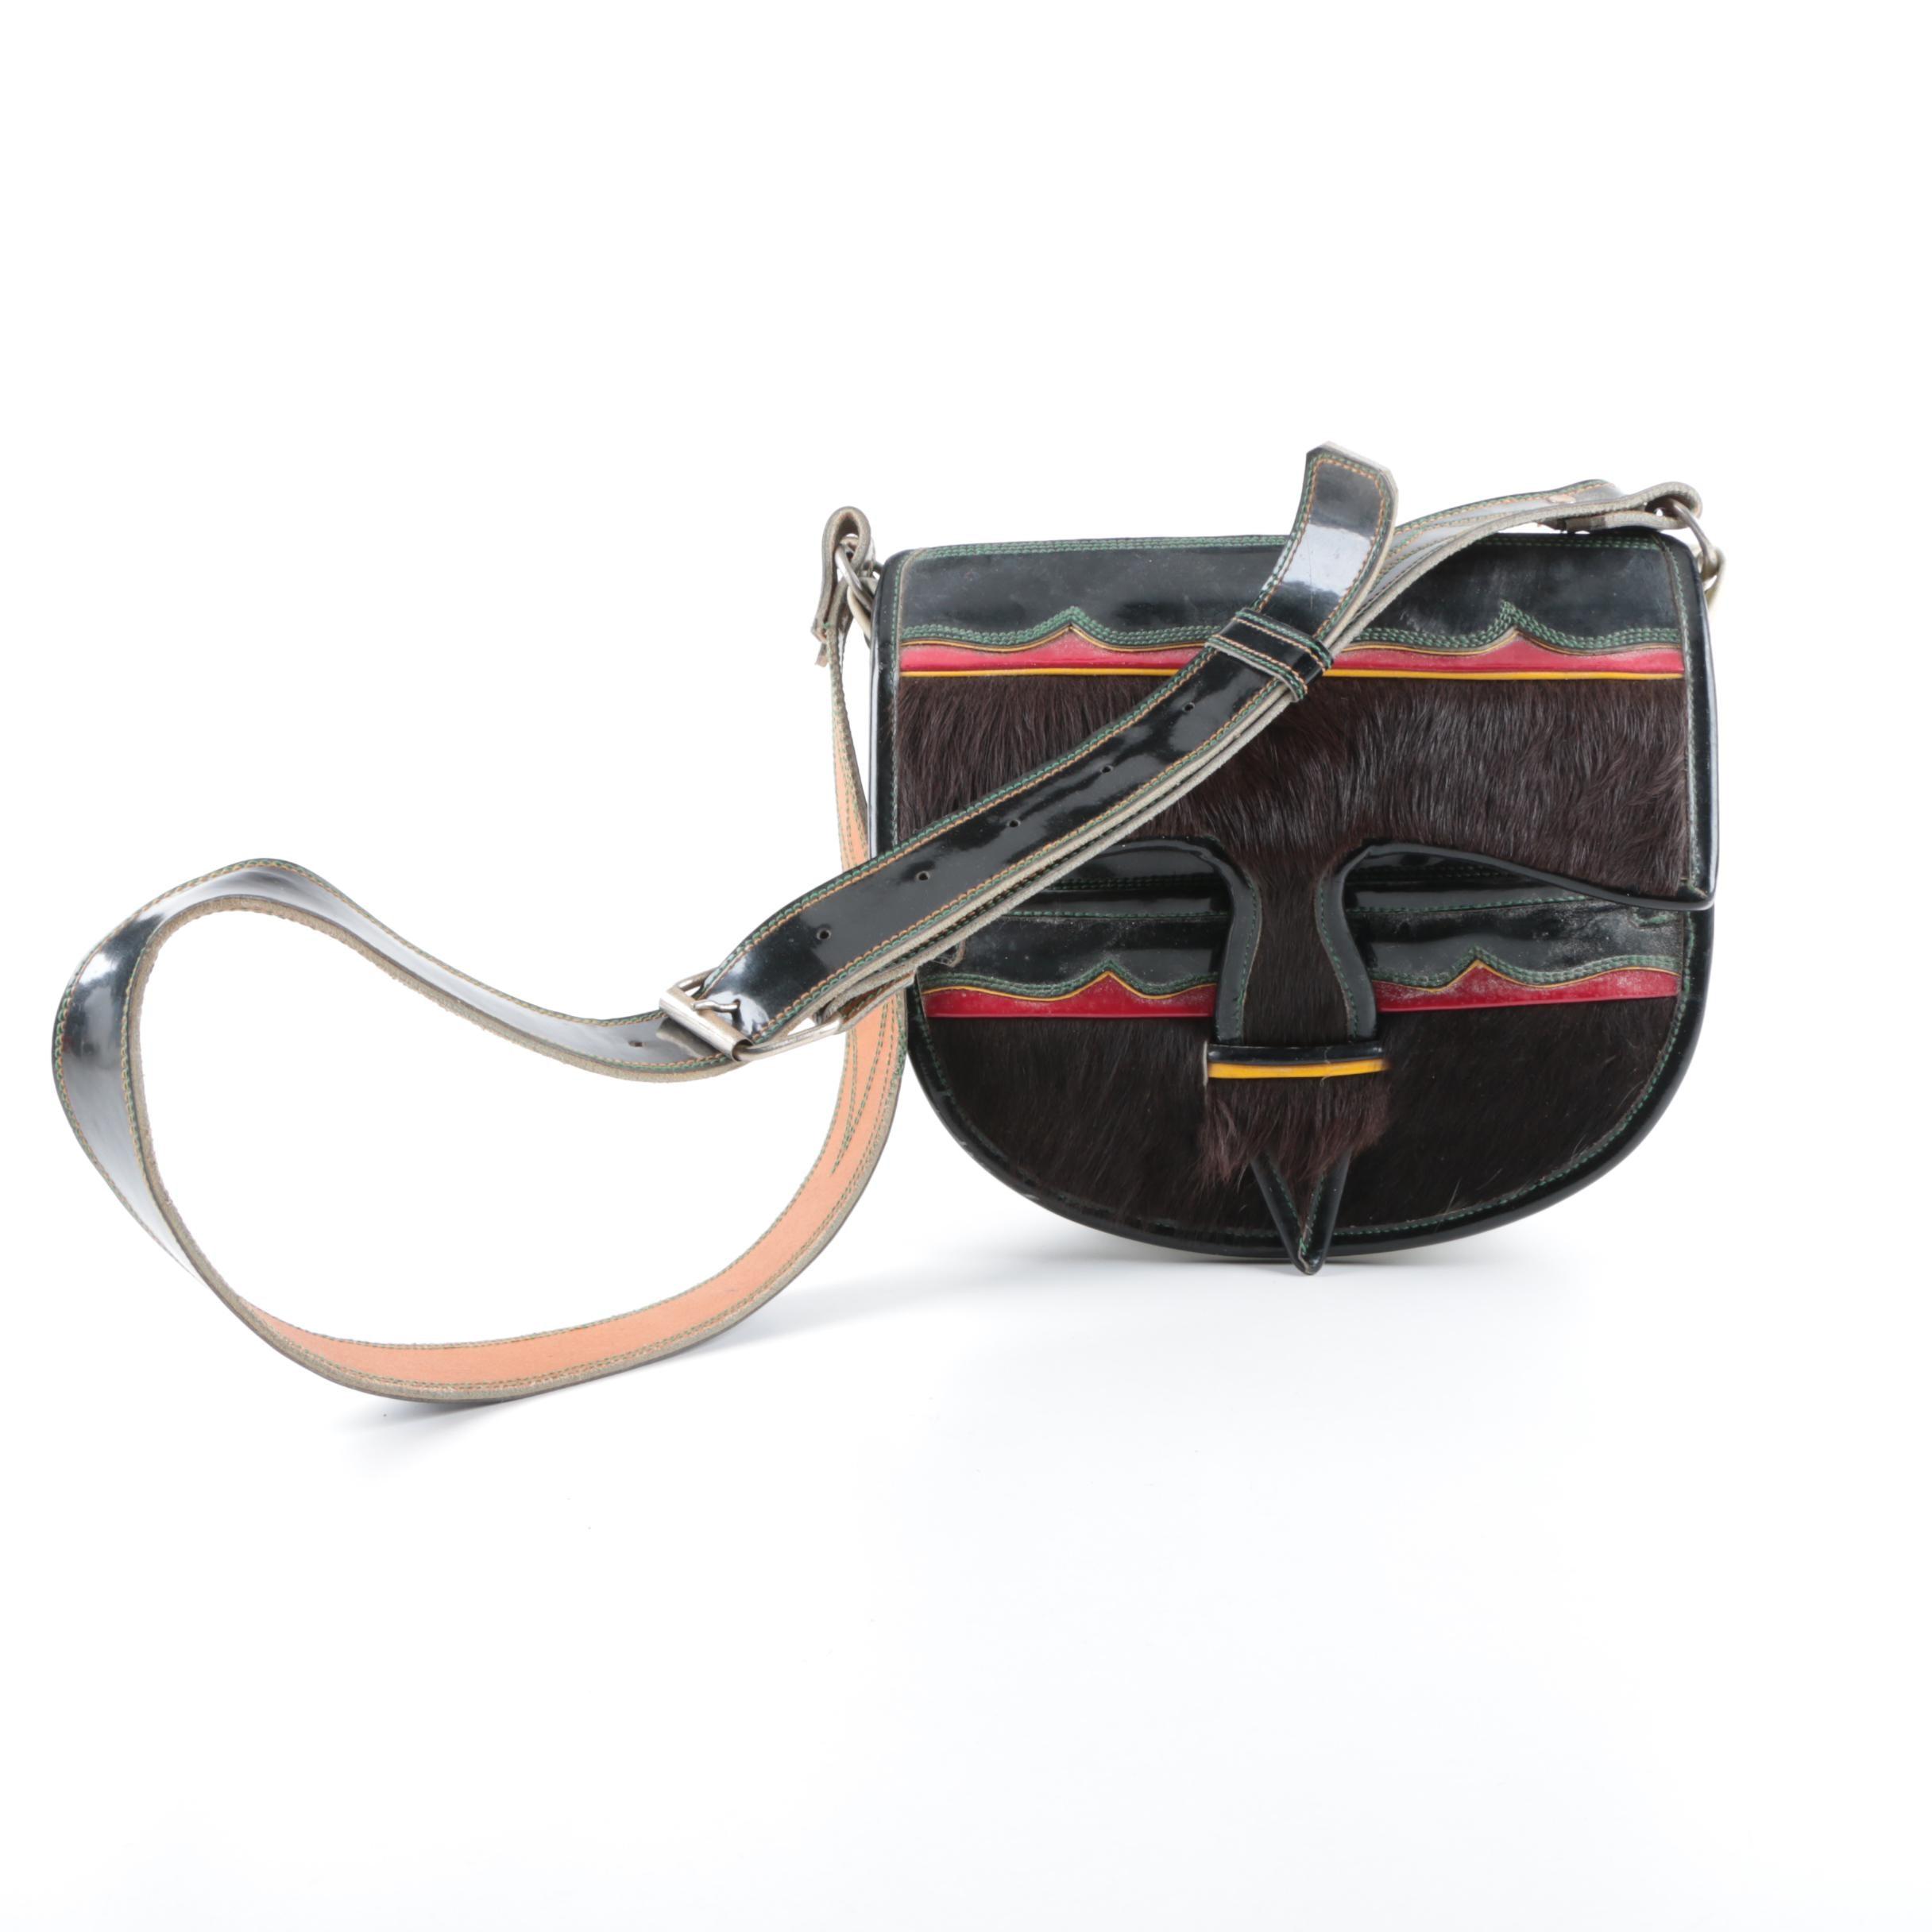 Carrieles Goat Hair and Leather Crossbody Handbag